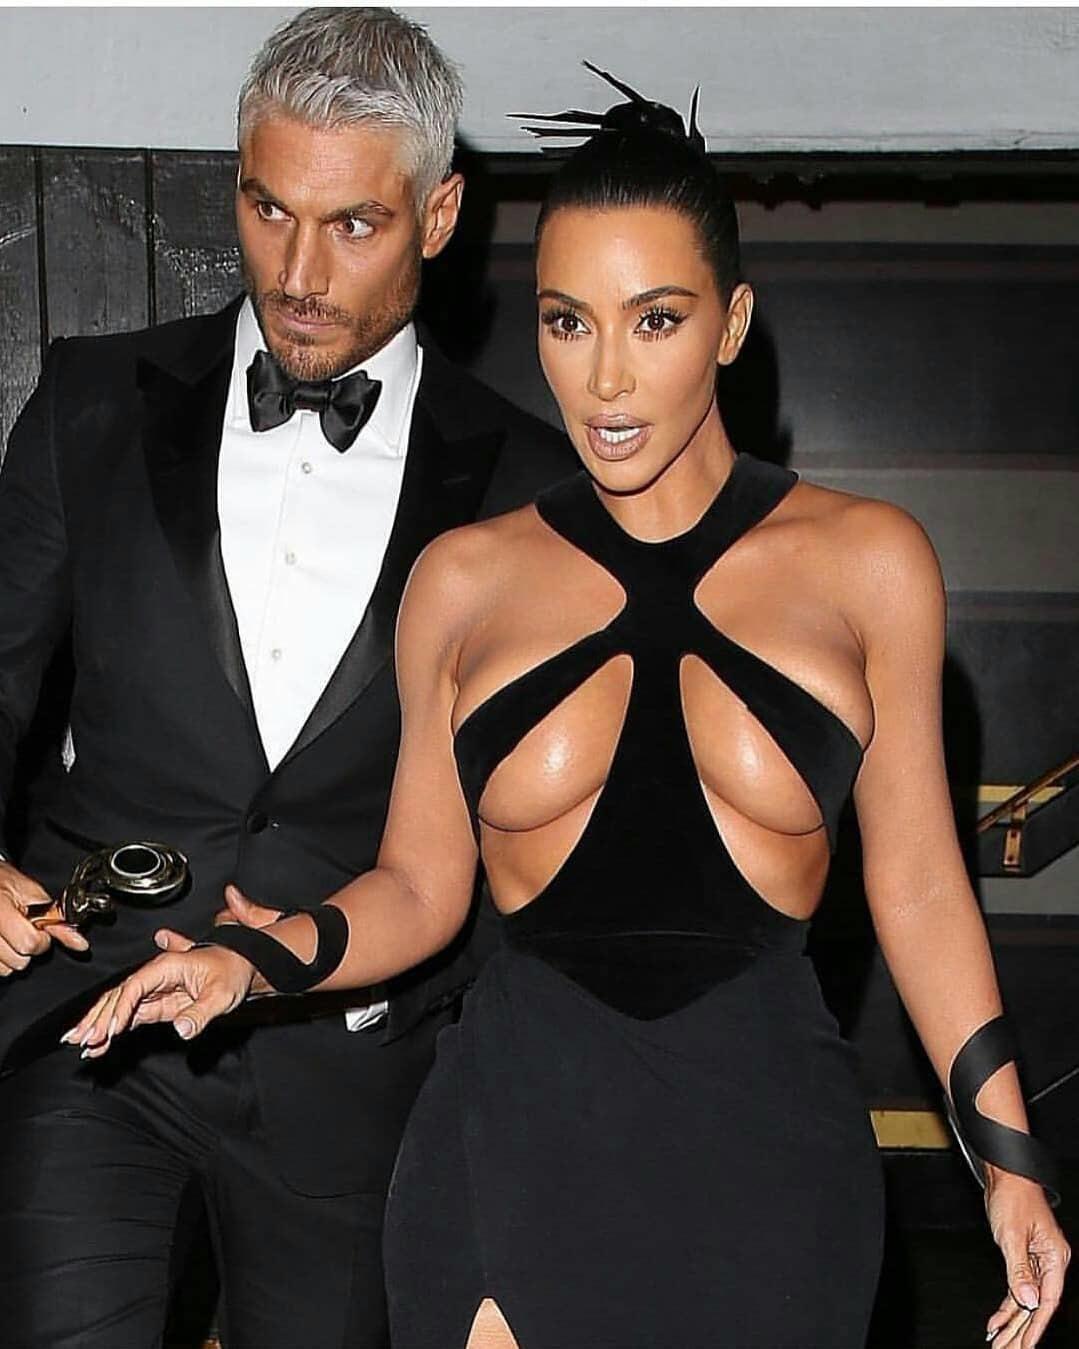 "<p>Фото:&nbsp;instagram/<a href=""https://www.instagram.com/kimkardashian/"" title=""kimkardashian"">kimkardashian</a></p>"